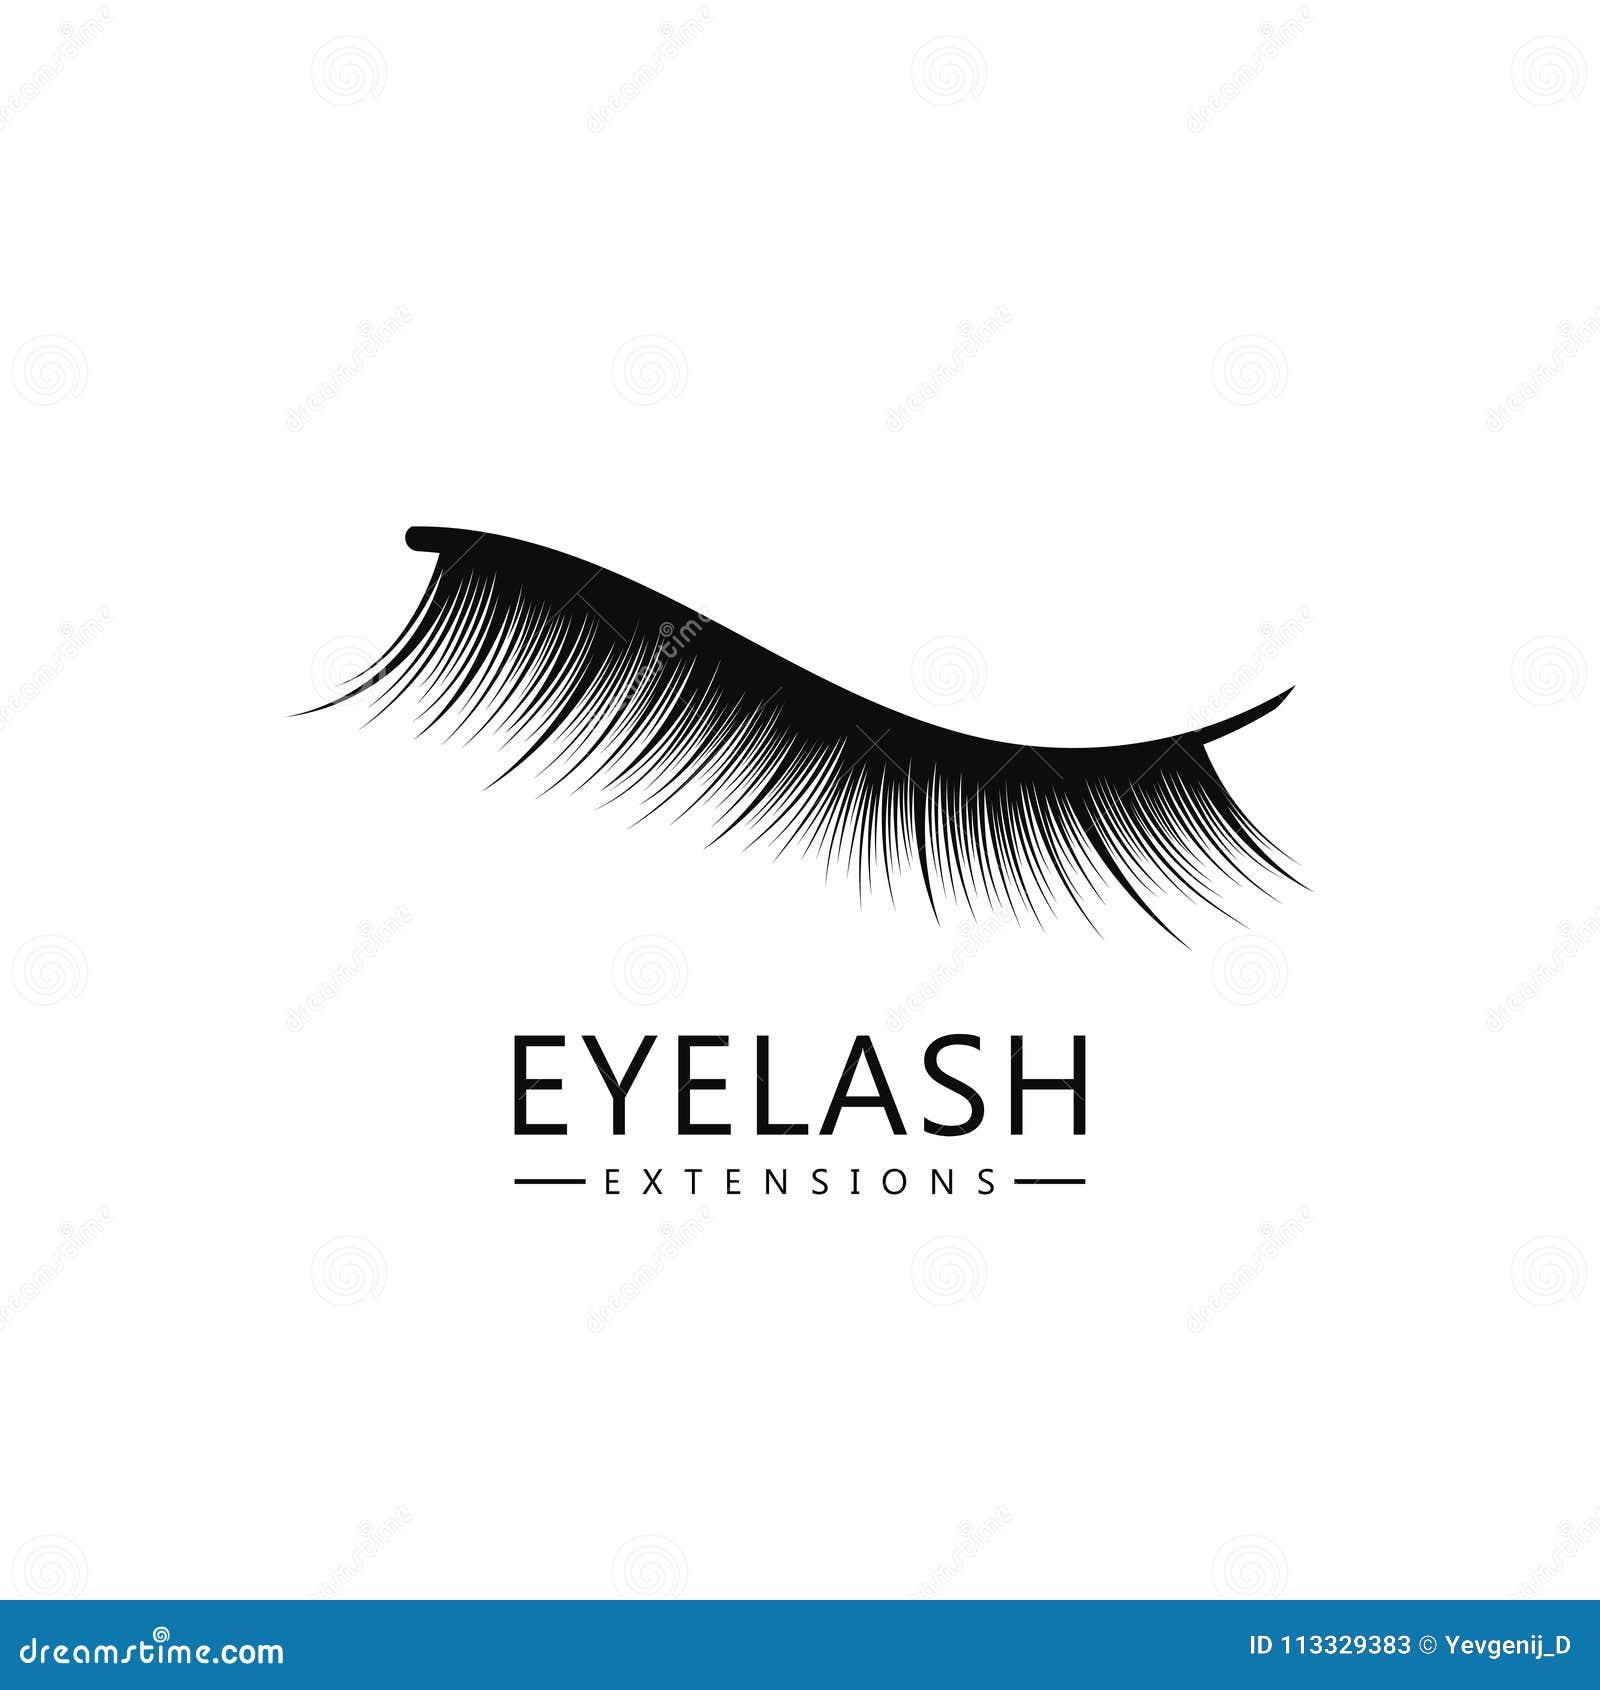 62a26b71cb9 Eyelash logo template, Eyelash extension concept. Lush black lashes on  white background for makeup